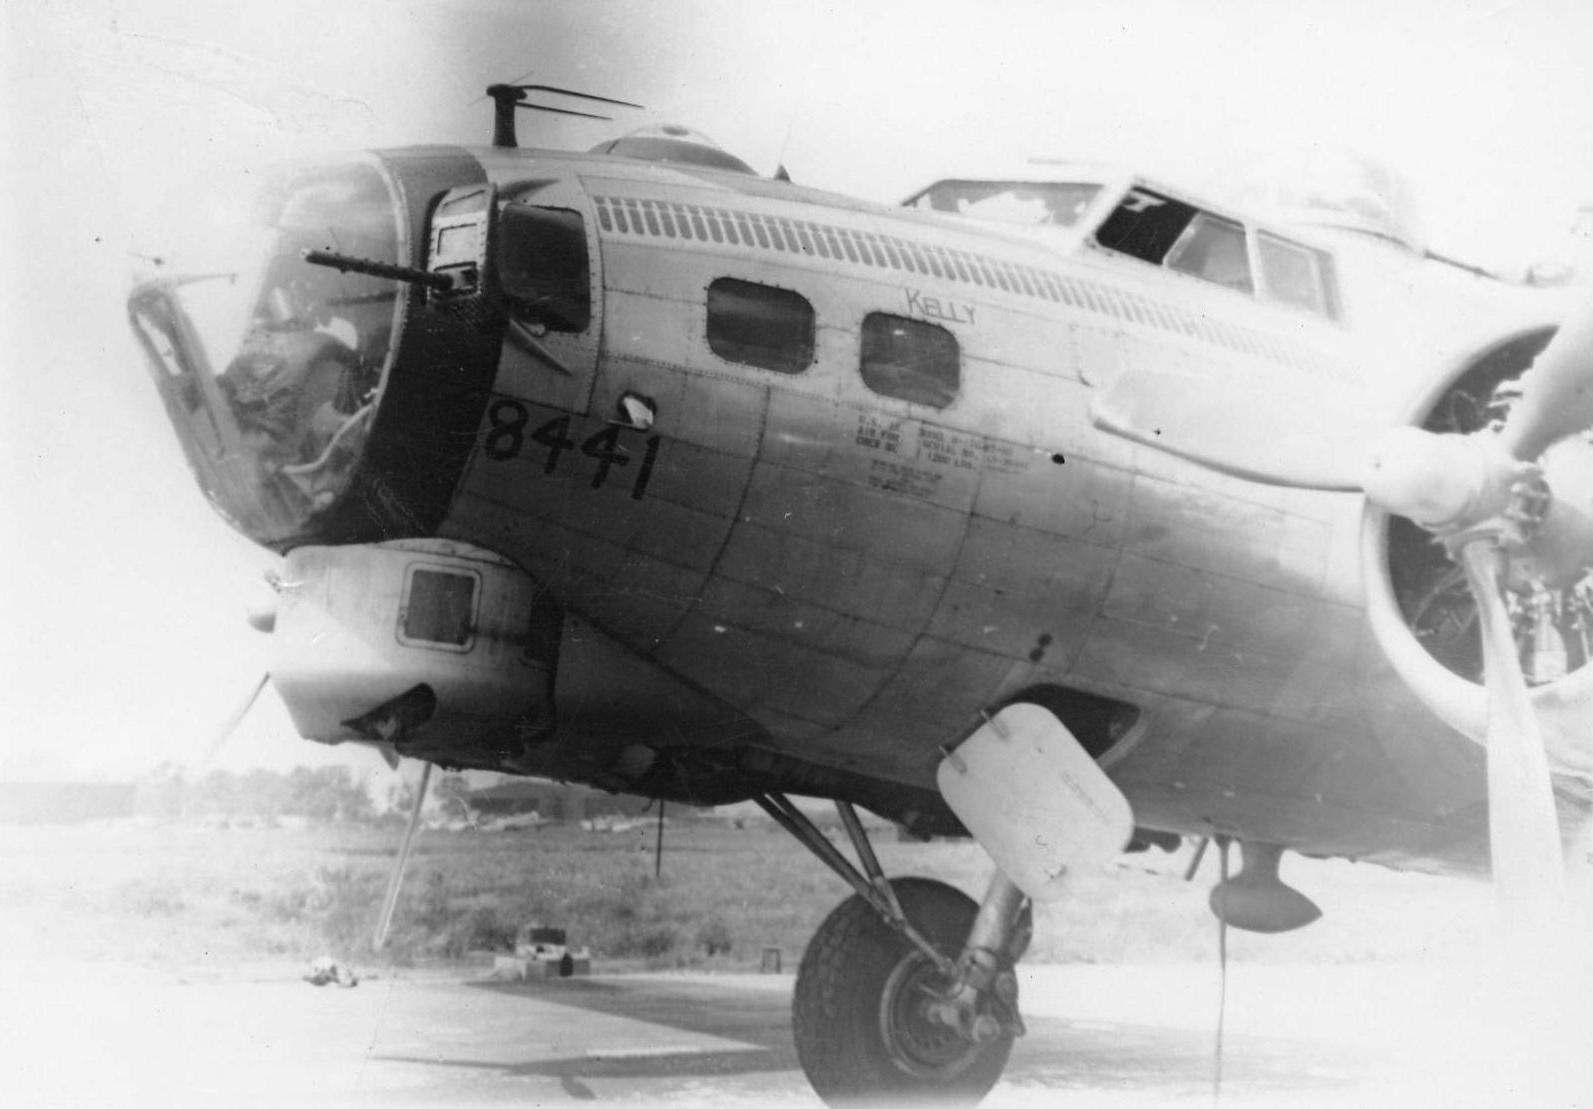 B-17 #43-38441